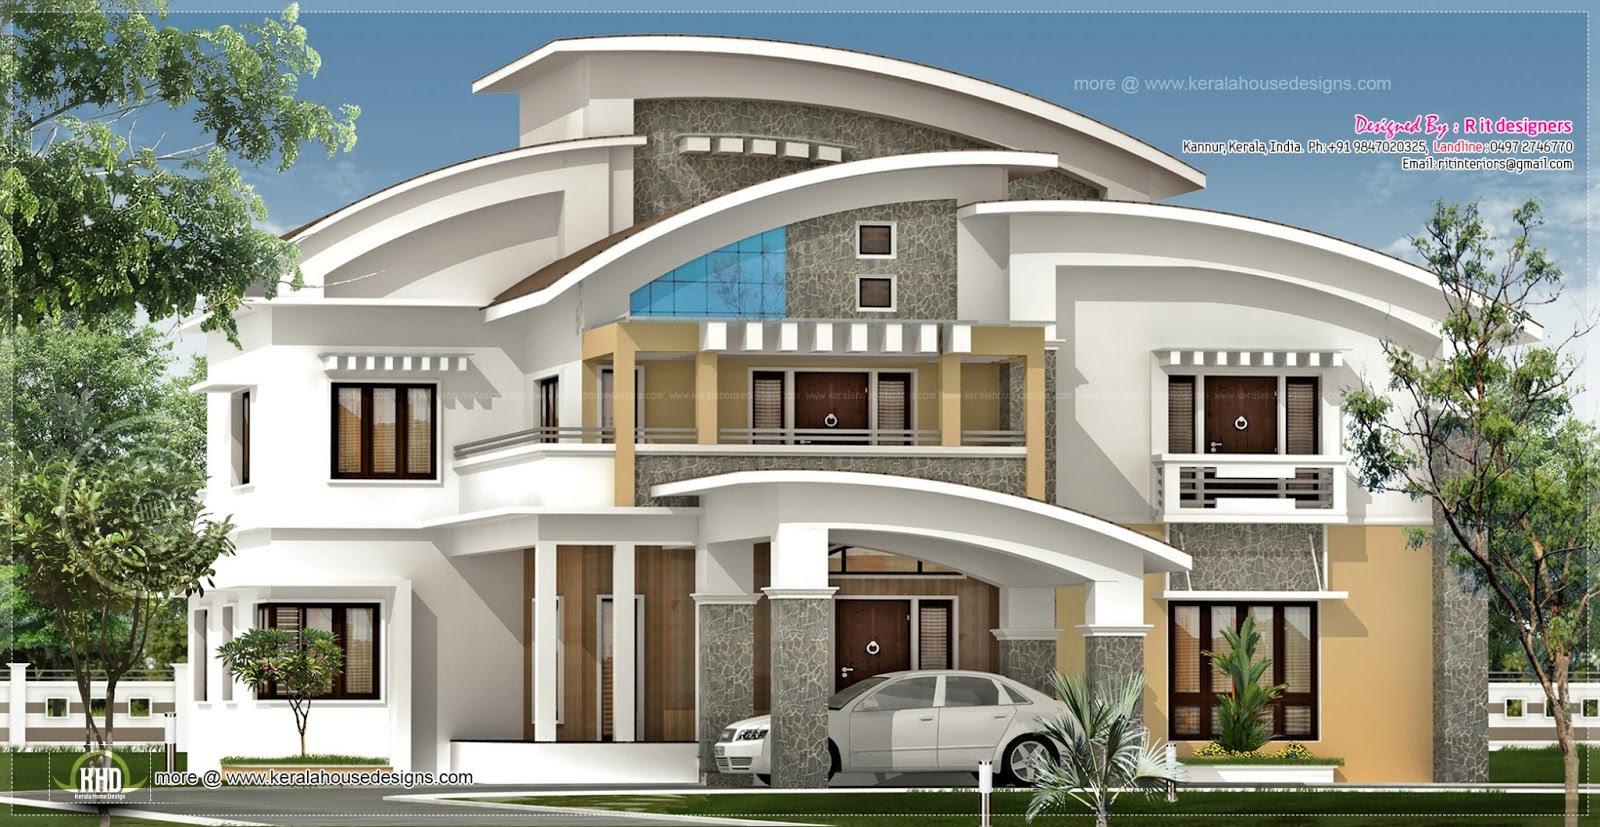 16 Luxury Home Designs Images Luxury House Plans Designs Luxury Back Yard Design Ideas And Mediterranean Sea Newdesignfile Com